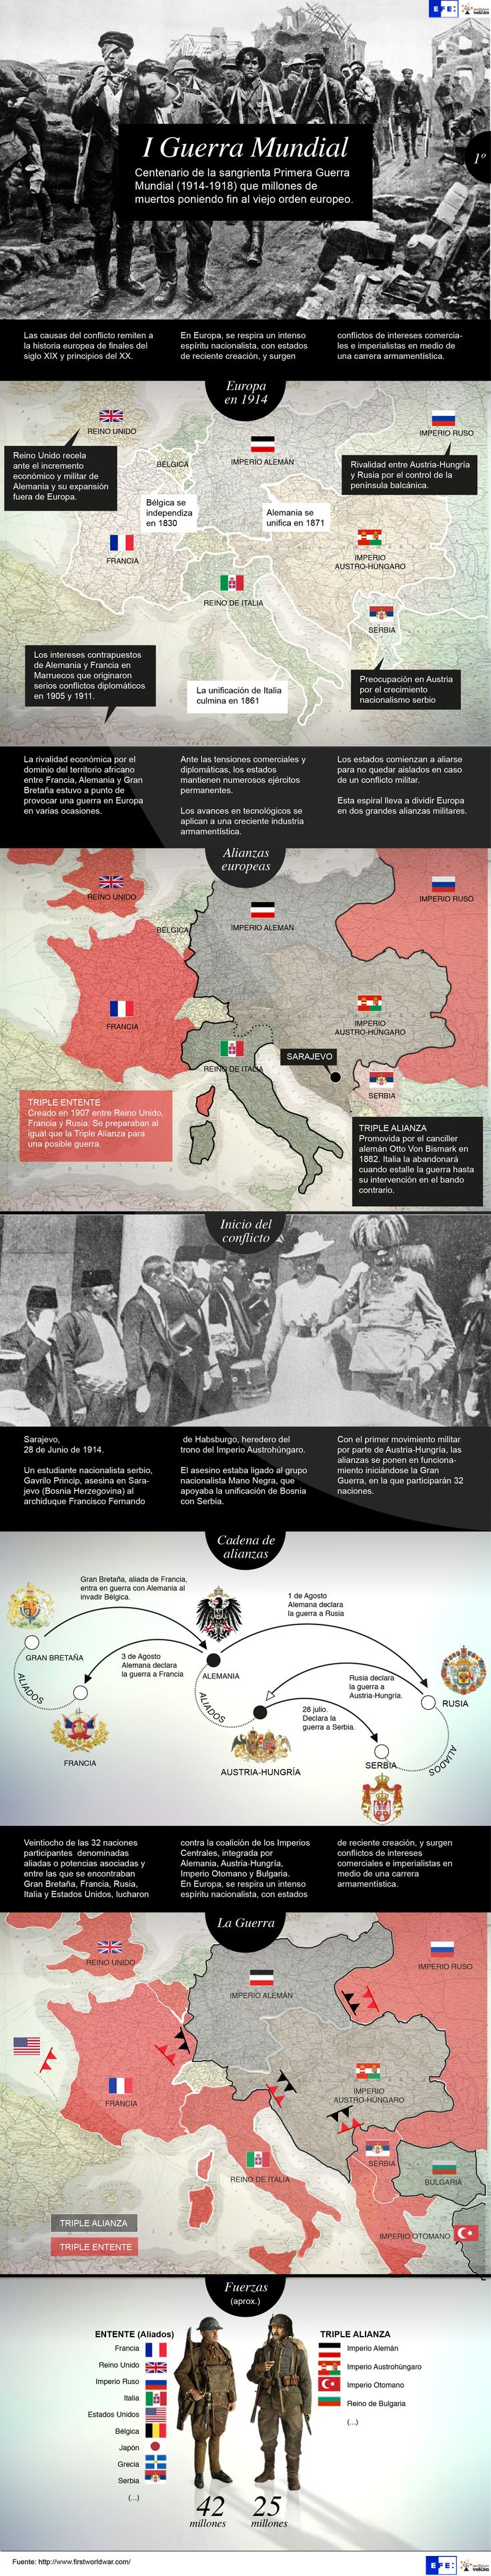 Primera Guerra Mundial. Europa en 1914. Agencia EFE.